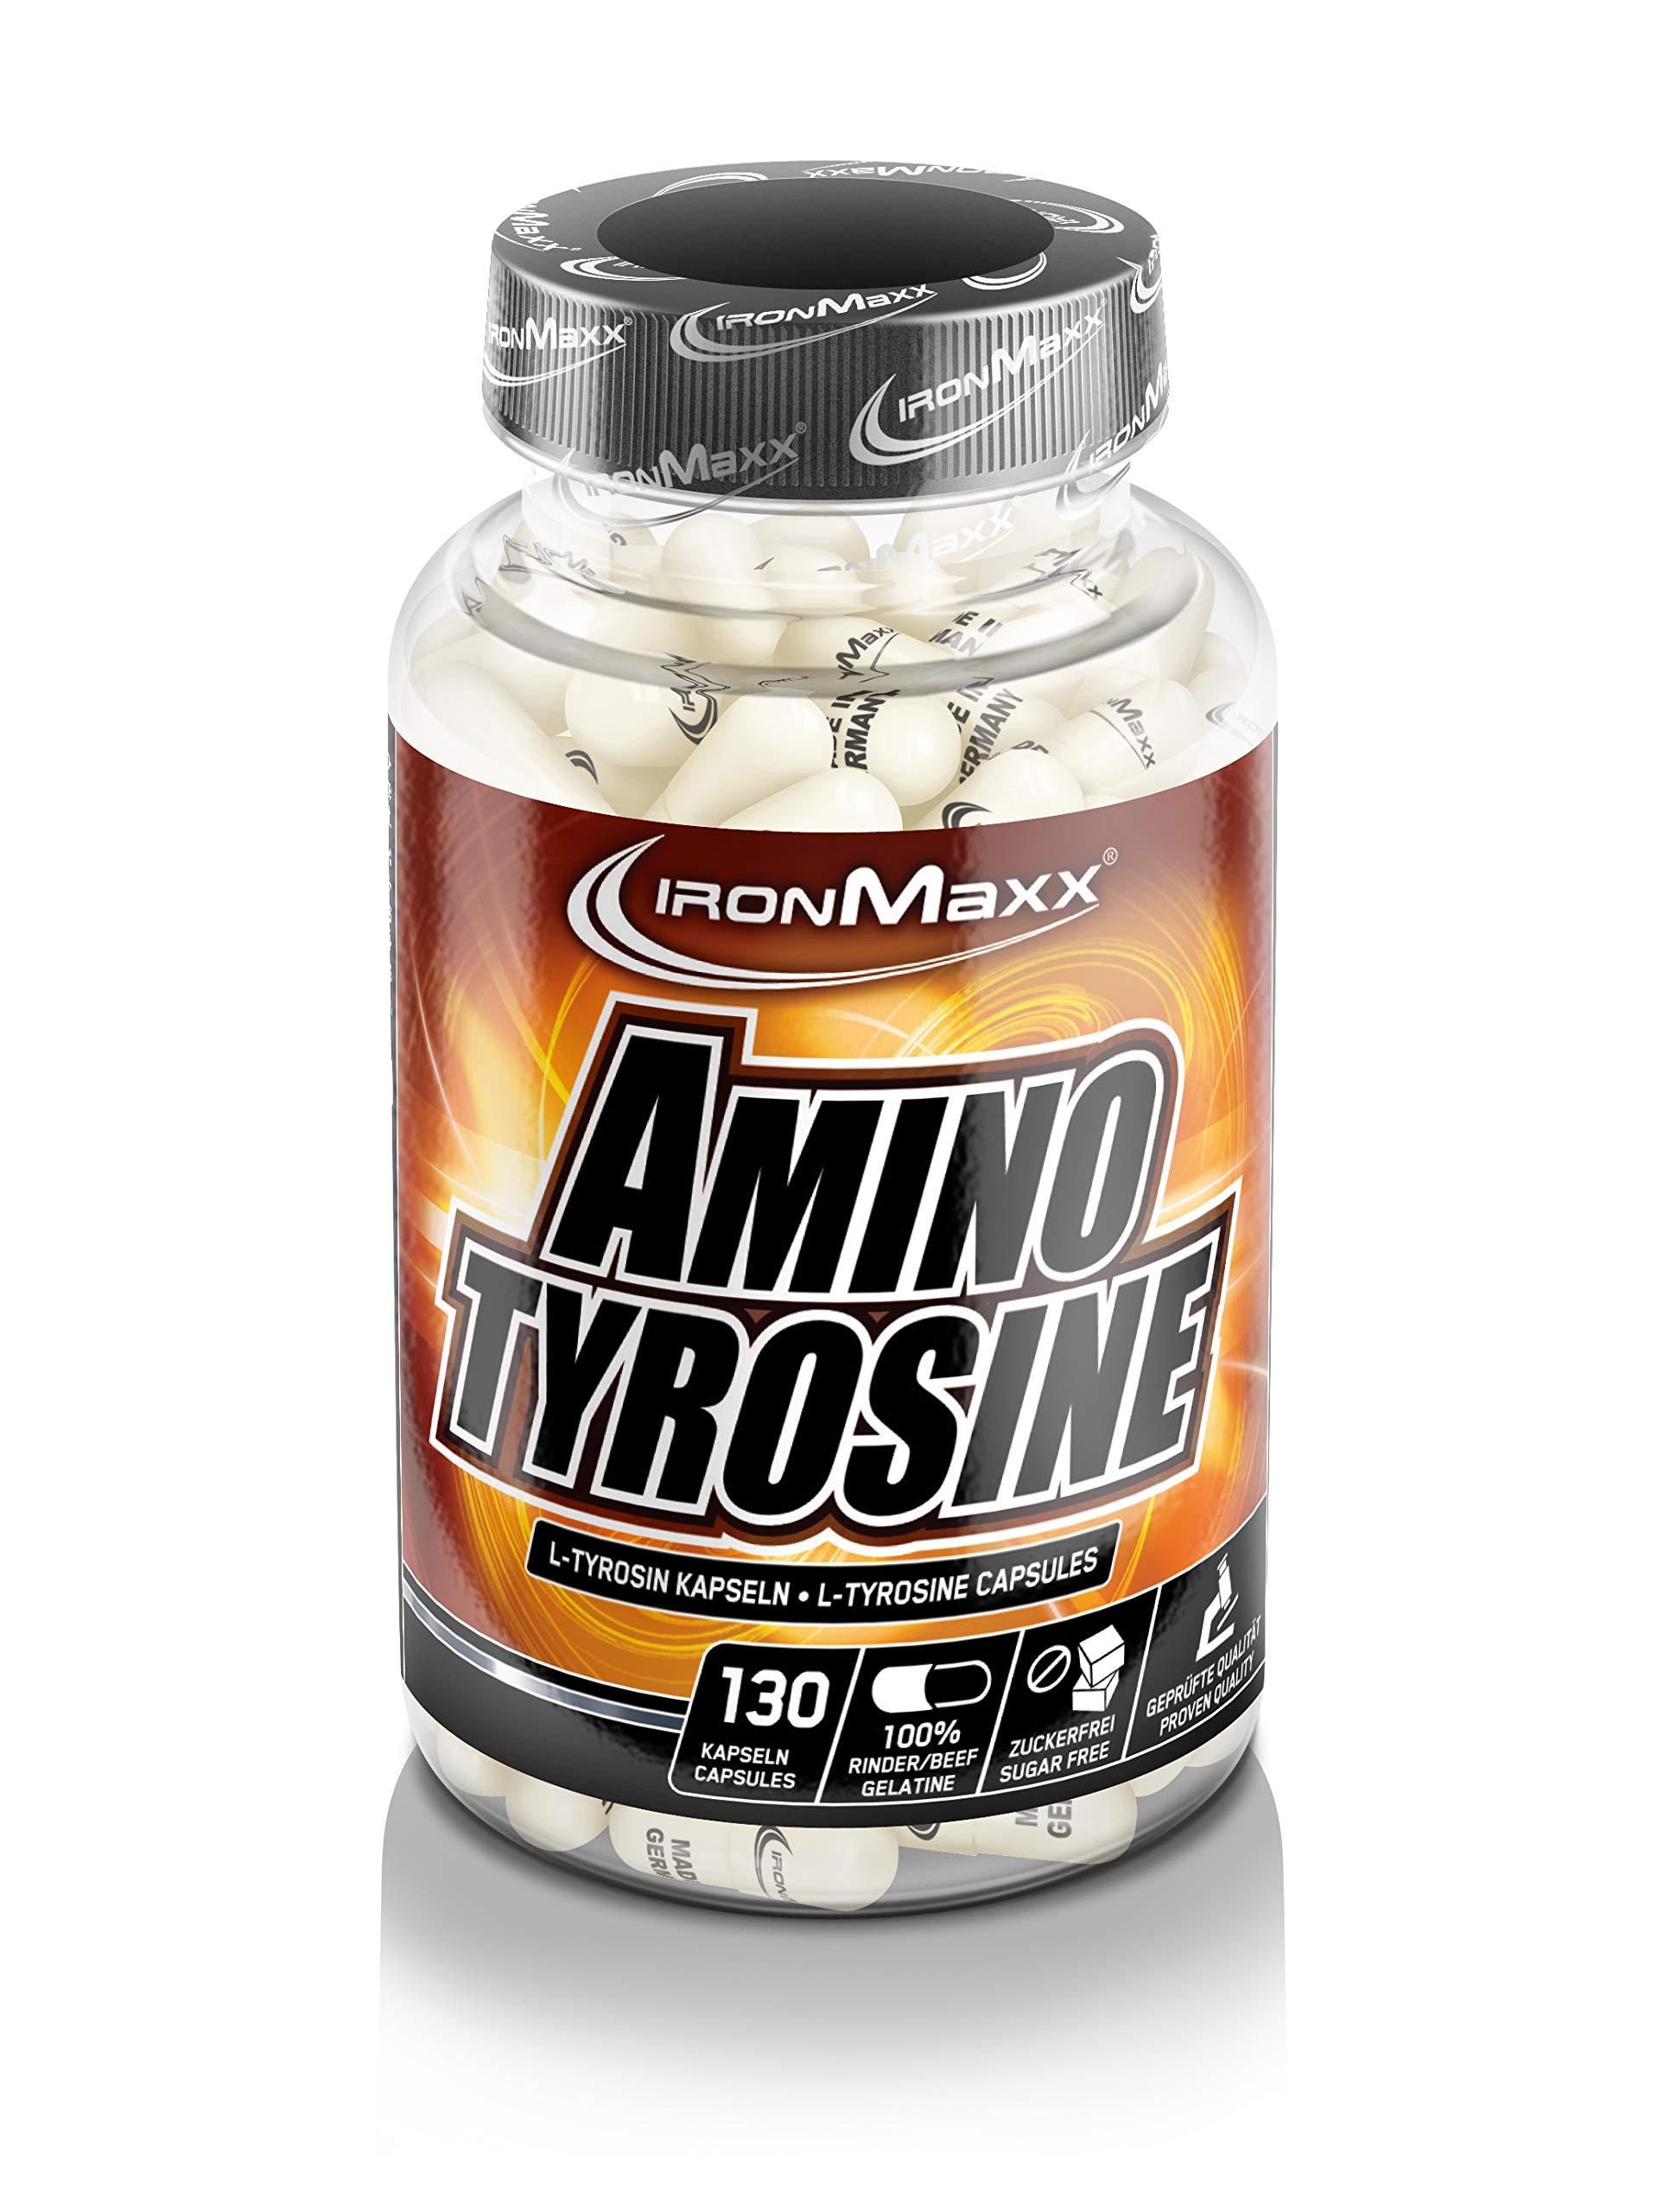 Ironmaxx Amino Tyrosine